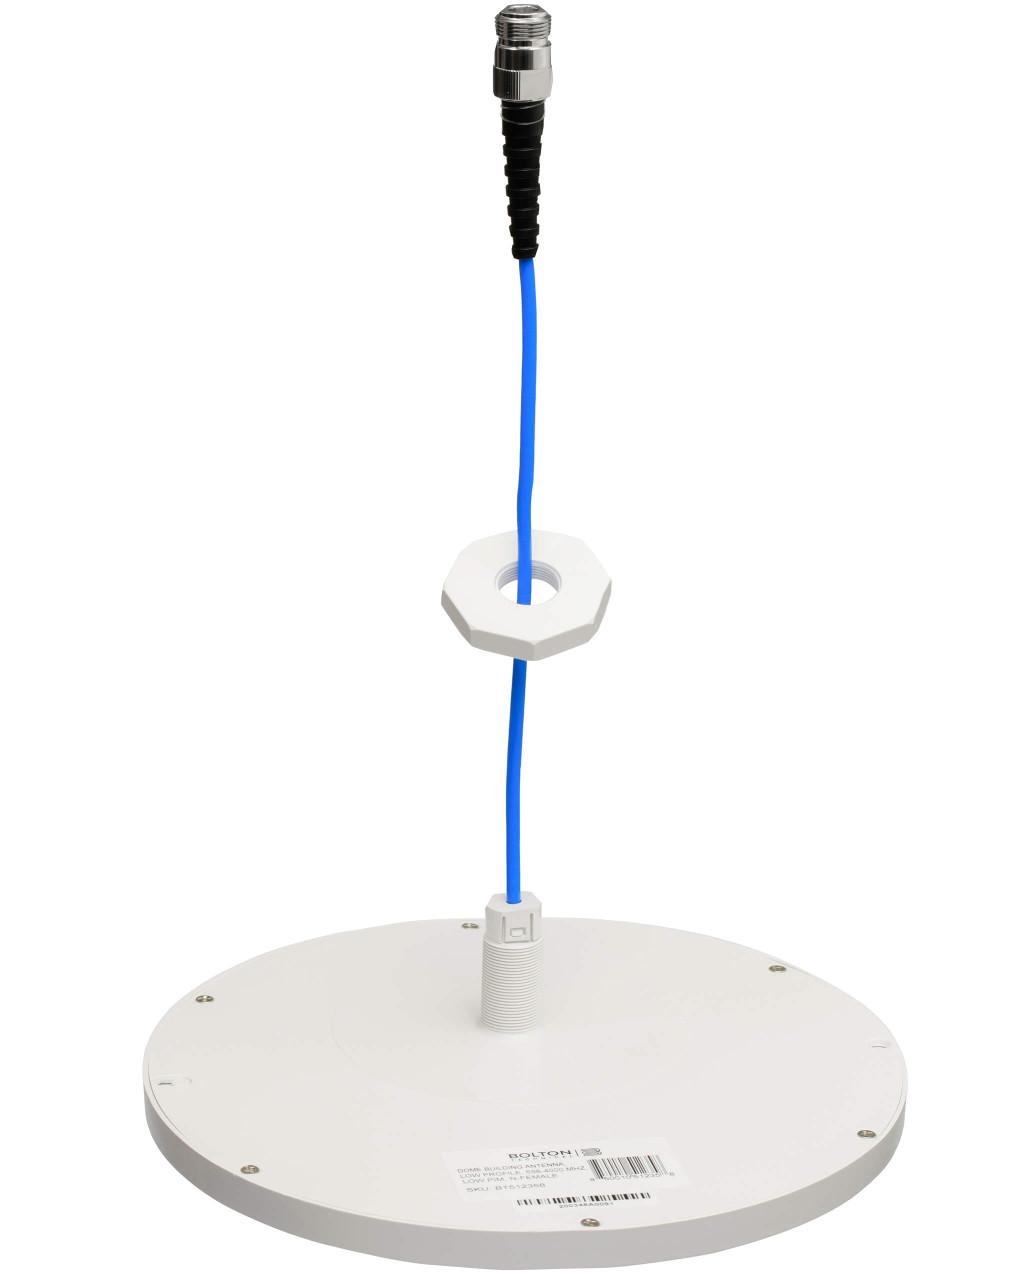 The RondoLow Profile Dome Antenna